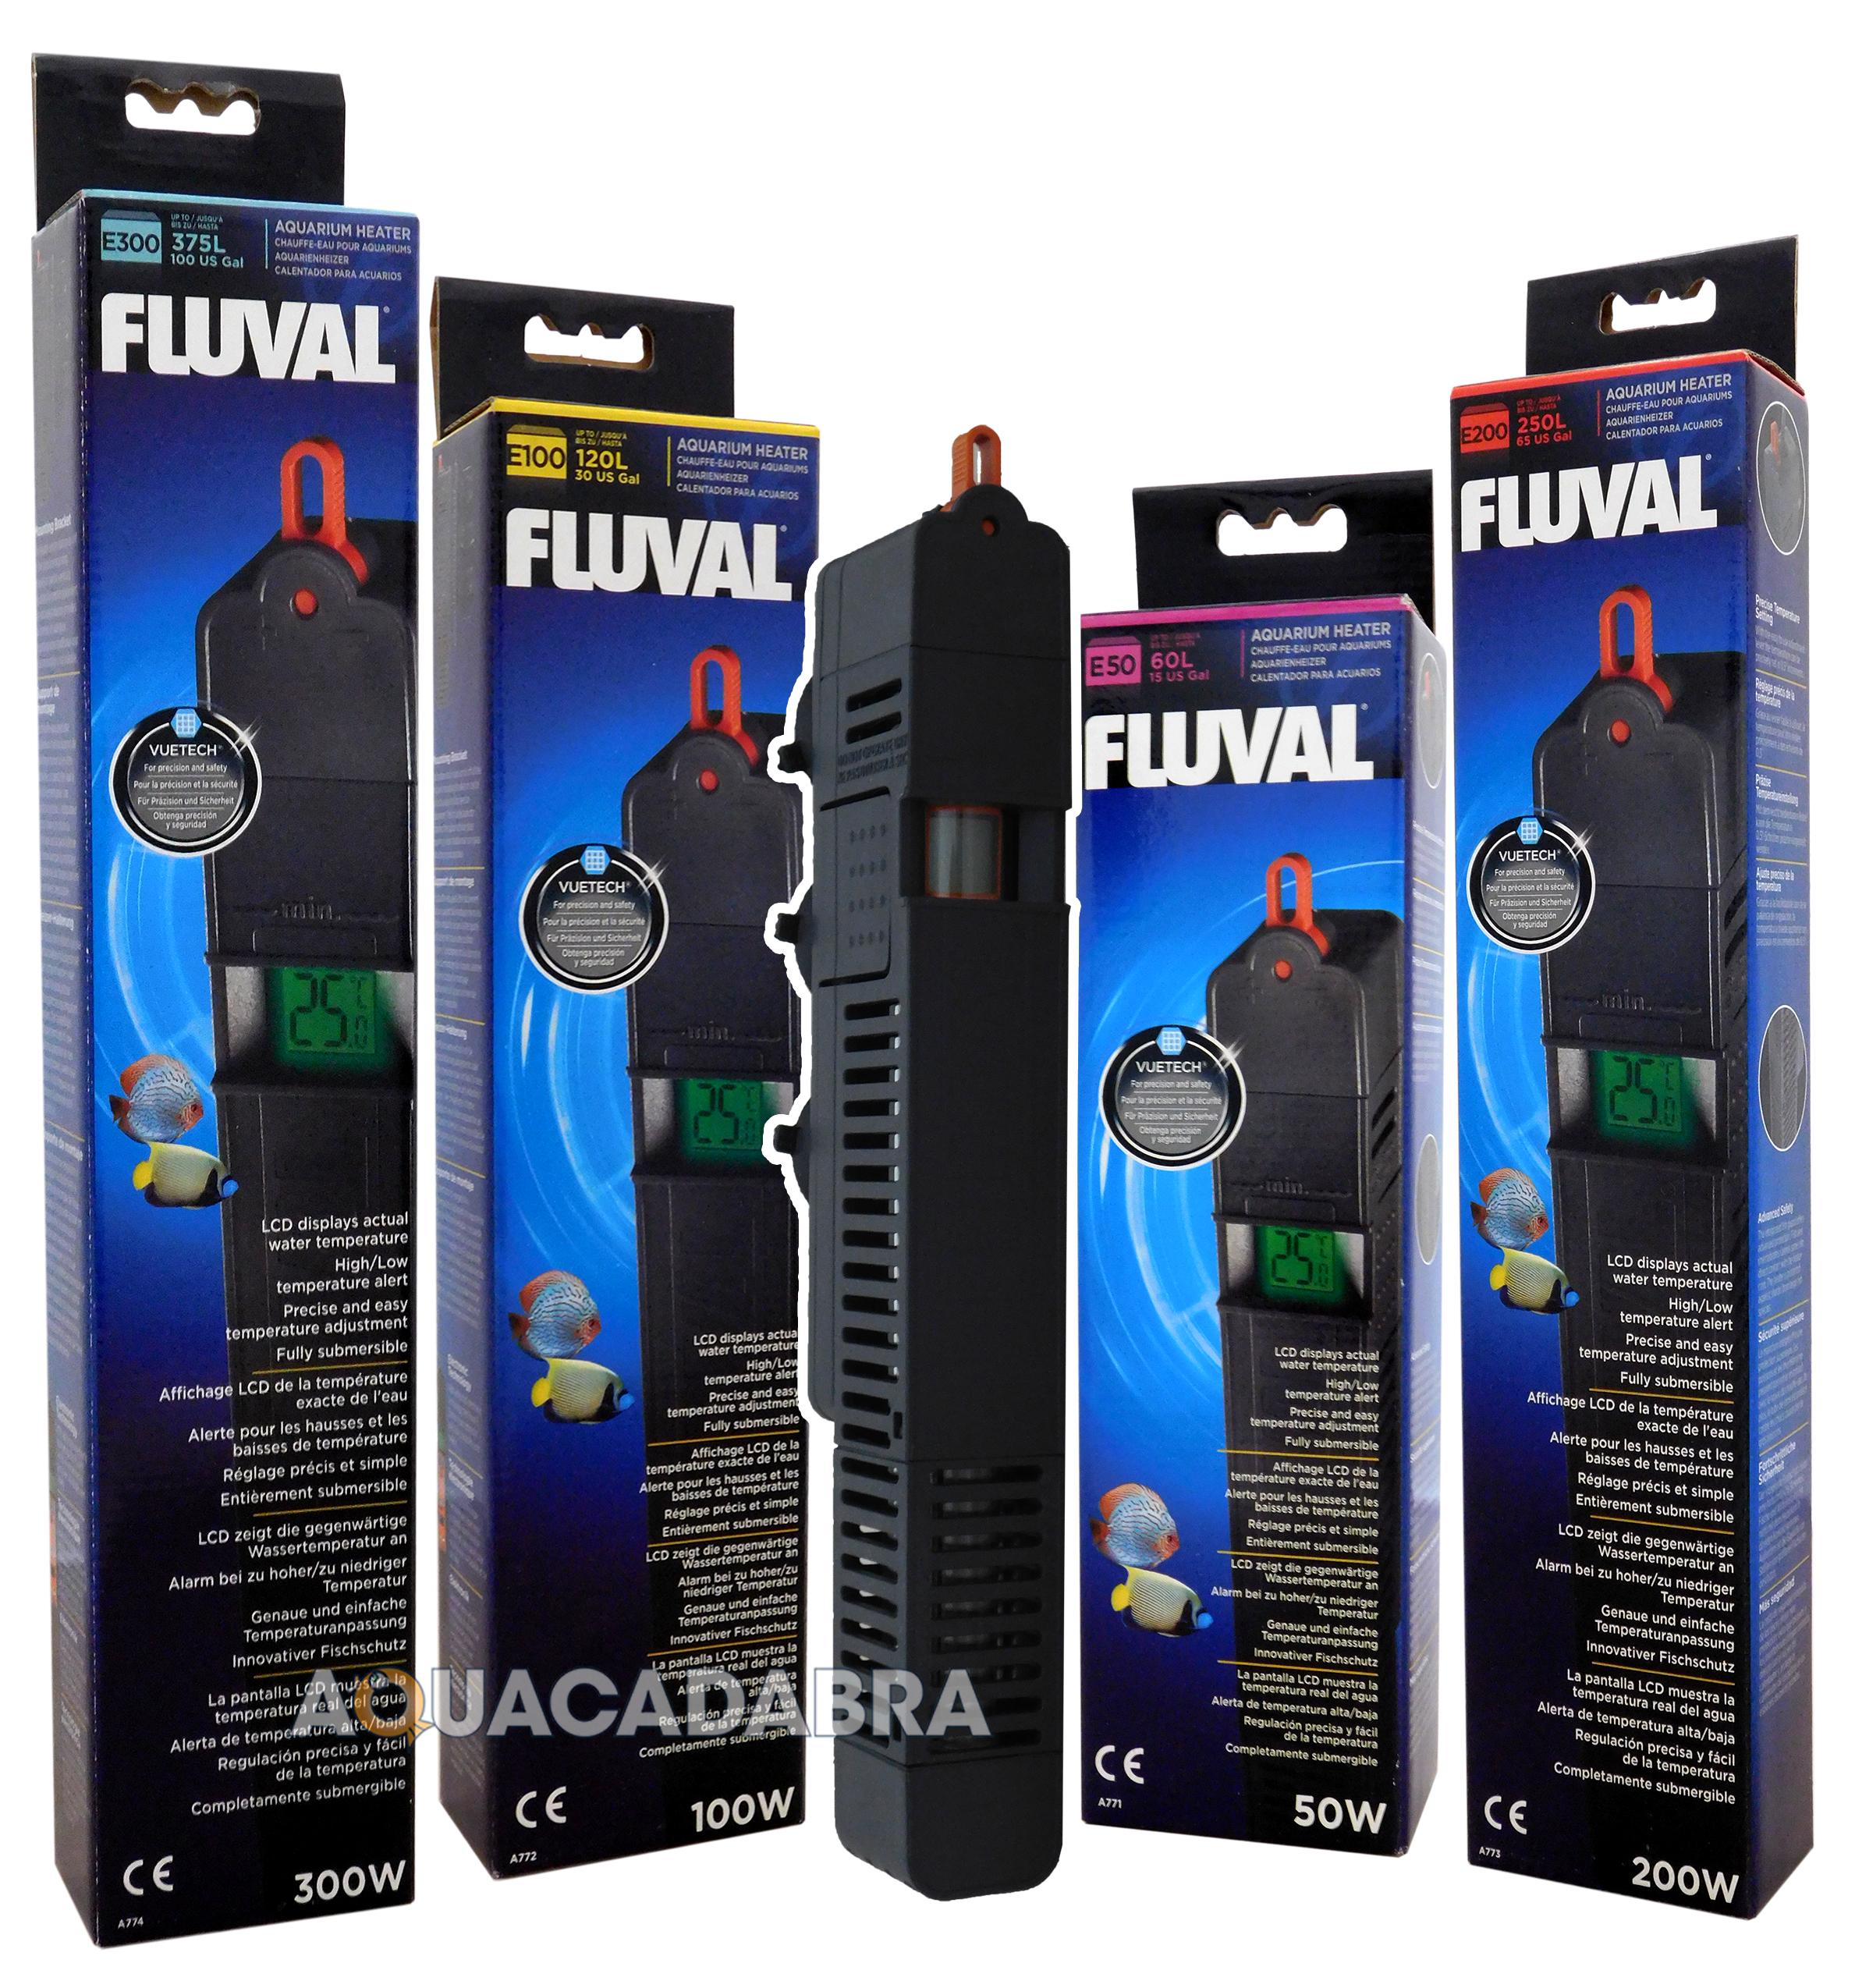 50w aquarium fish tank heater - Fluval E 50w 100w 200w 300w Electronic Fish Tank Heater E50 E100 E200 E300